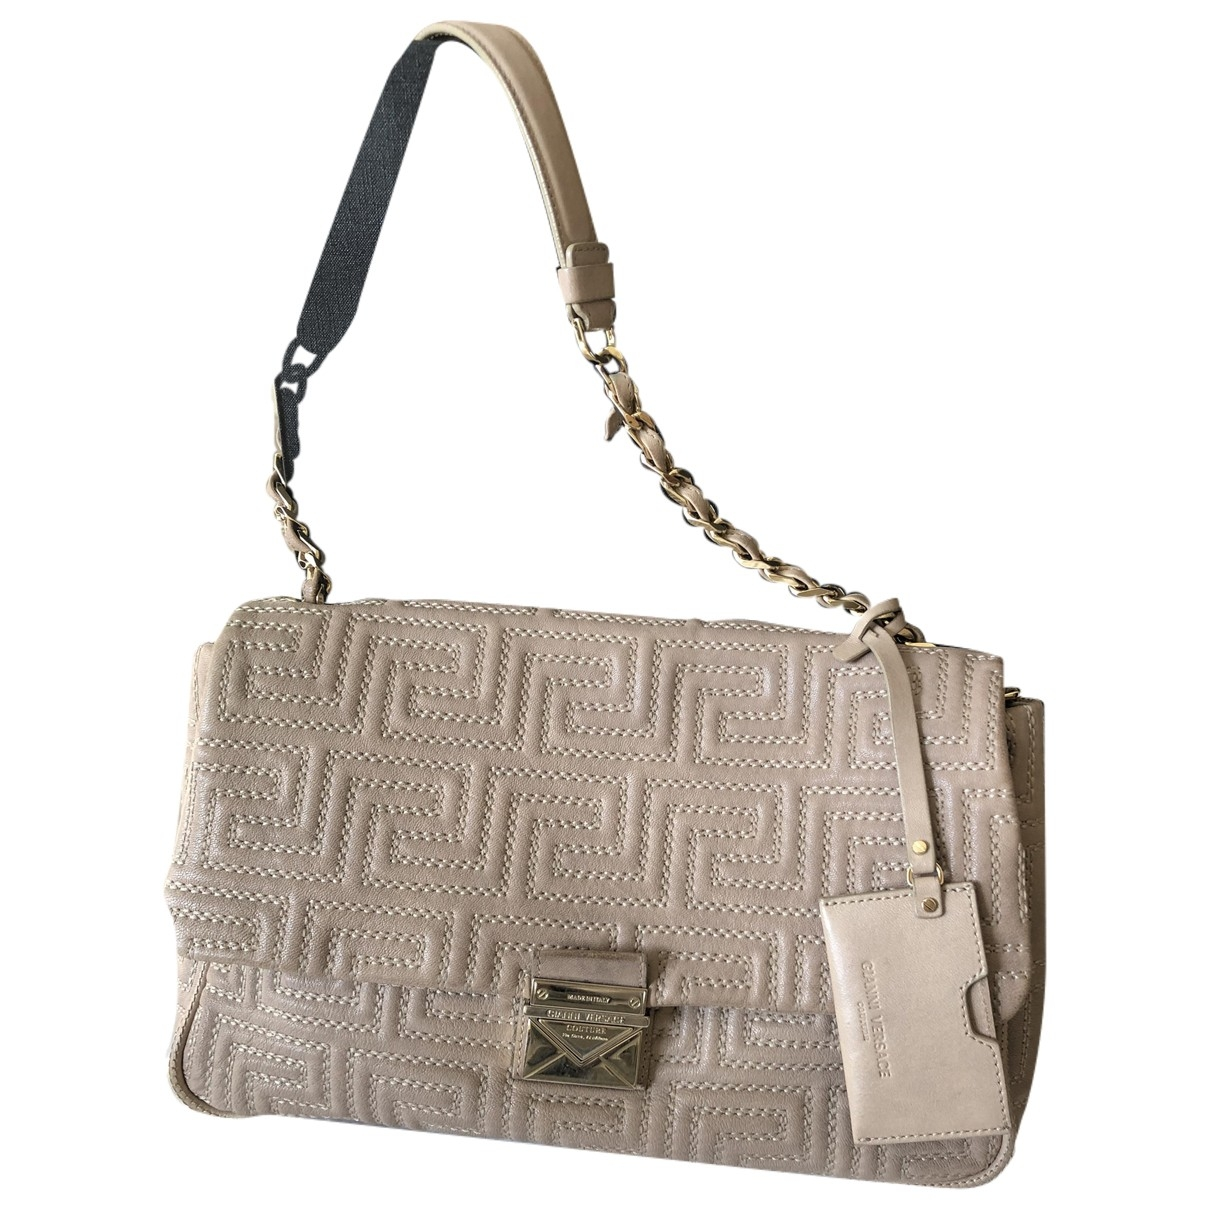 Gianni Versace - Sac a main   pour femme en cuir - beige